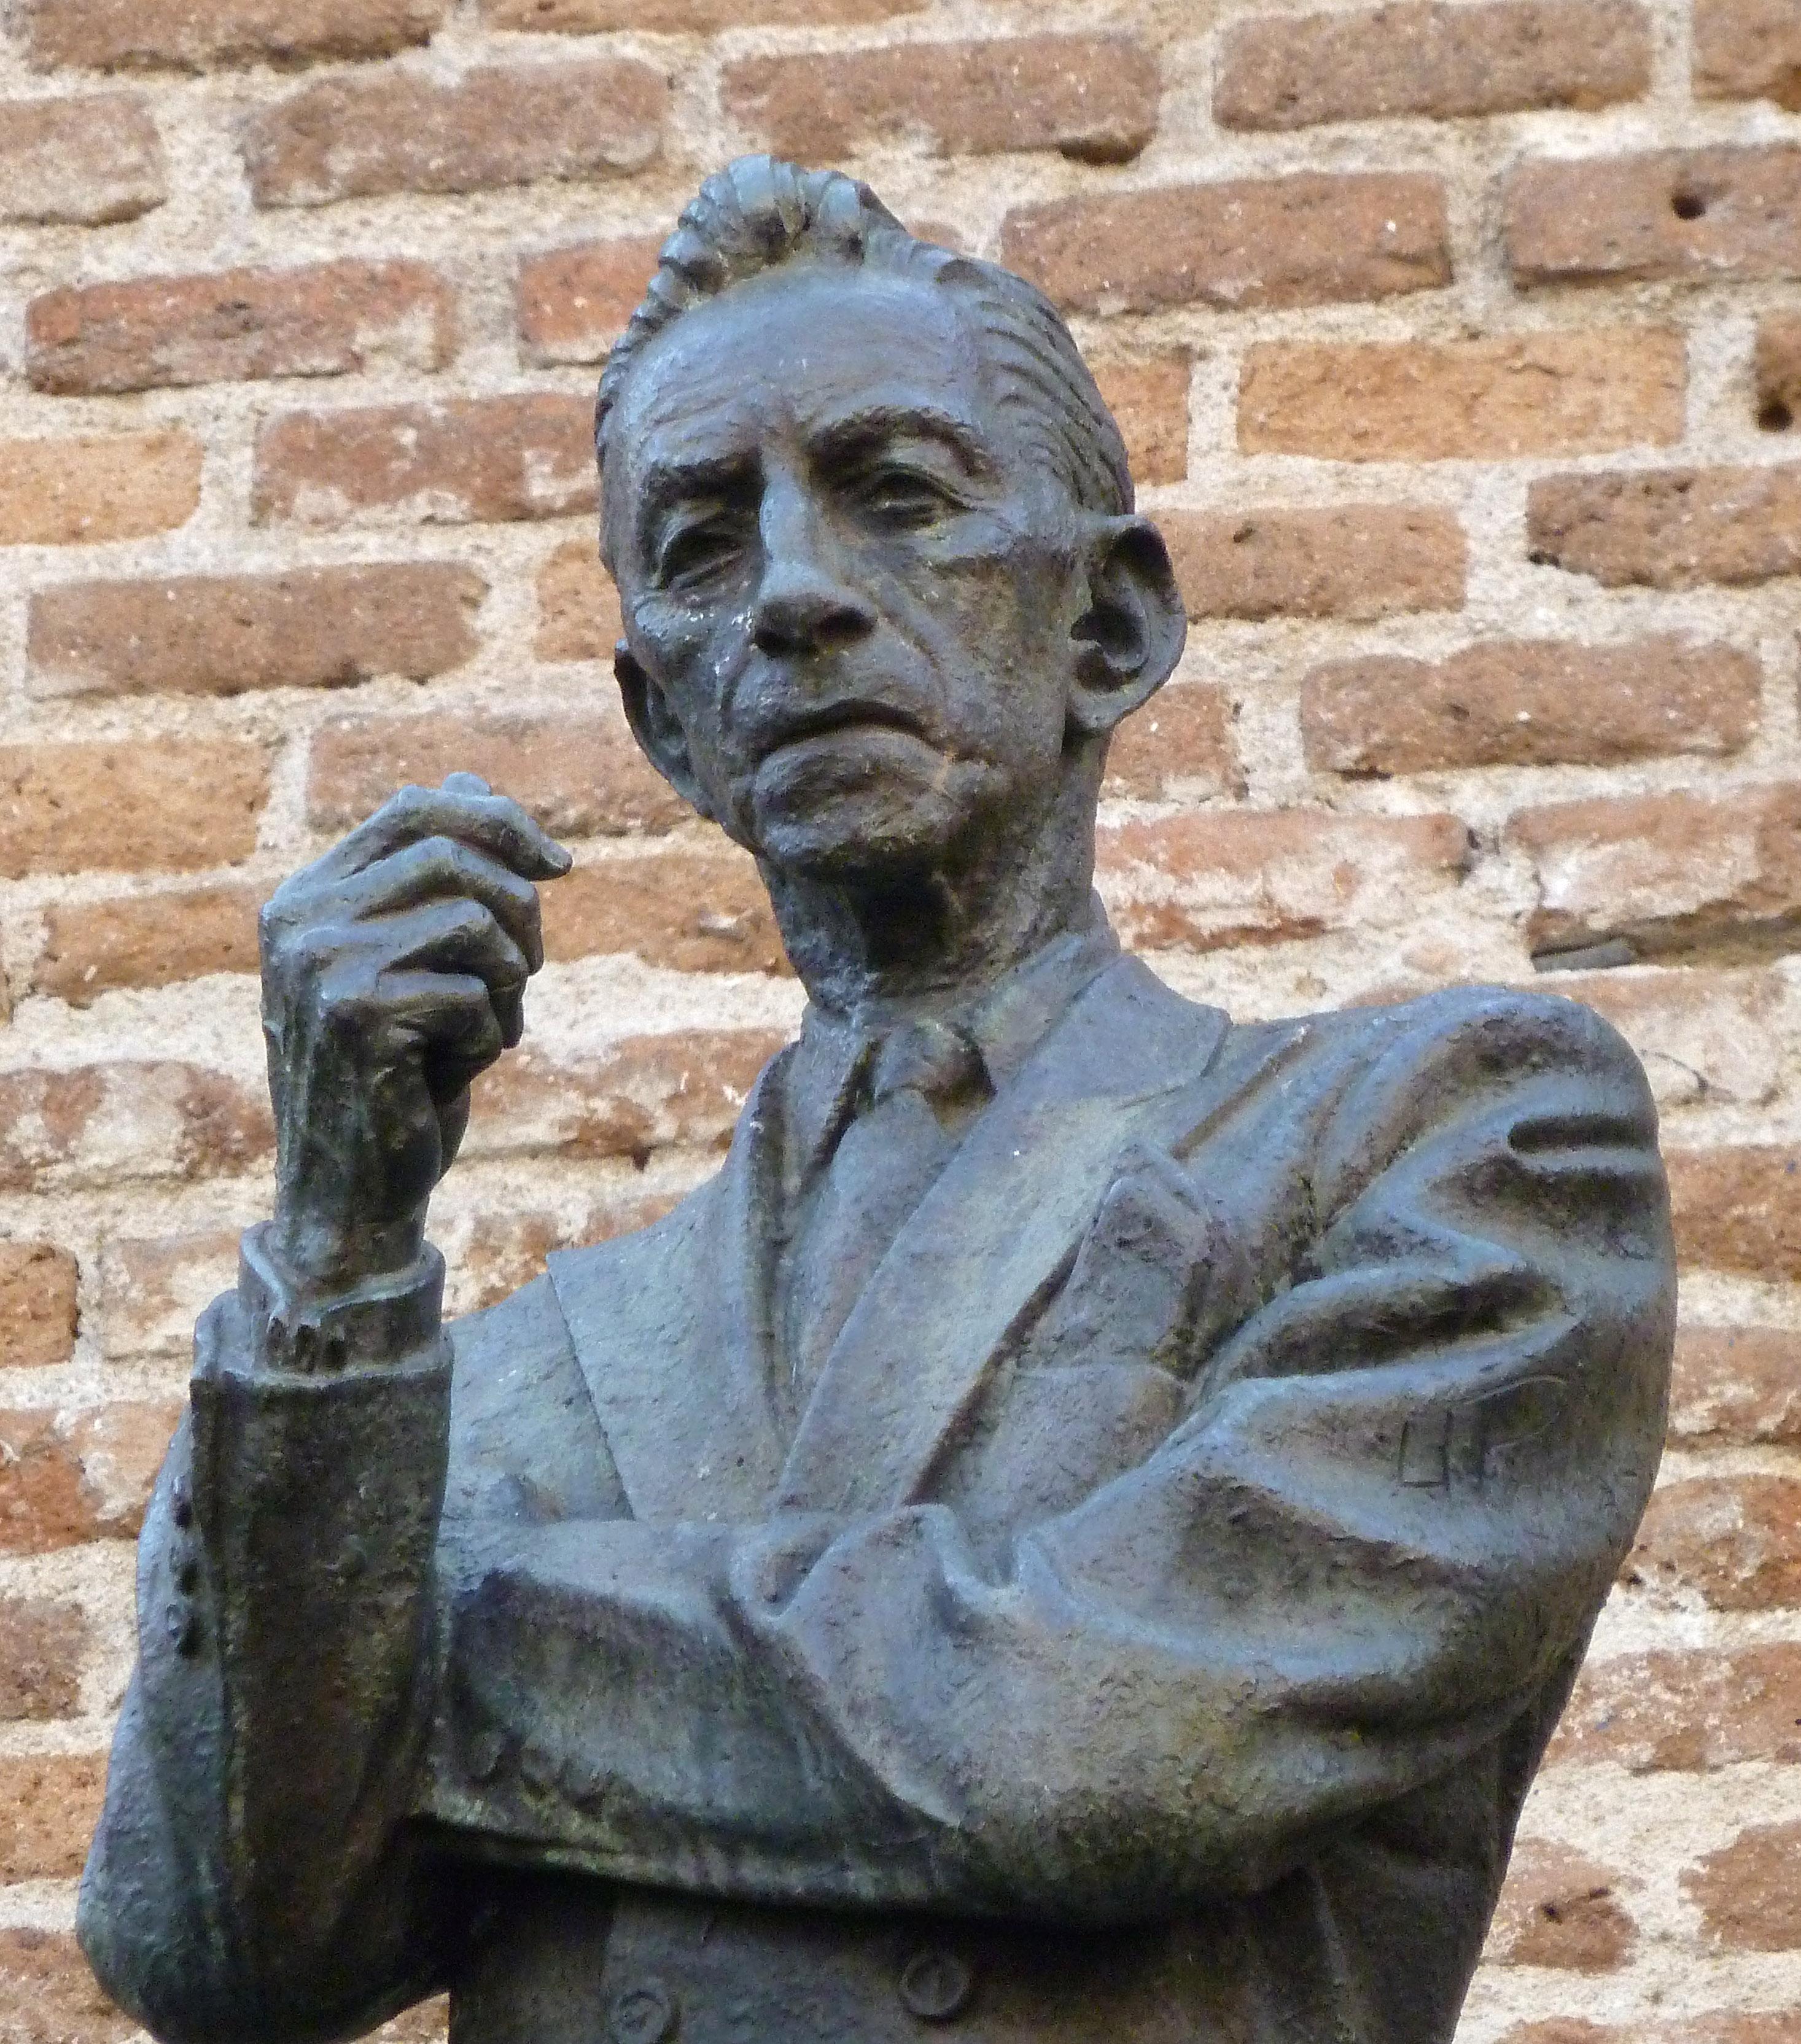 Estatua de Agustín Lara en Madrid, obra de Humberto Peraza y Ojeda